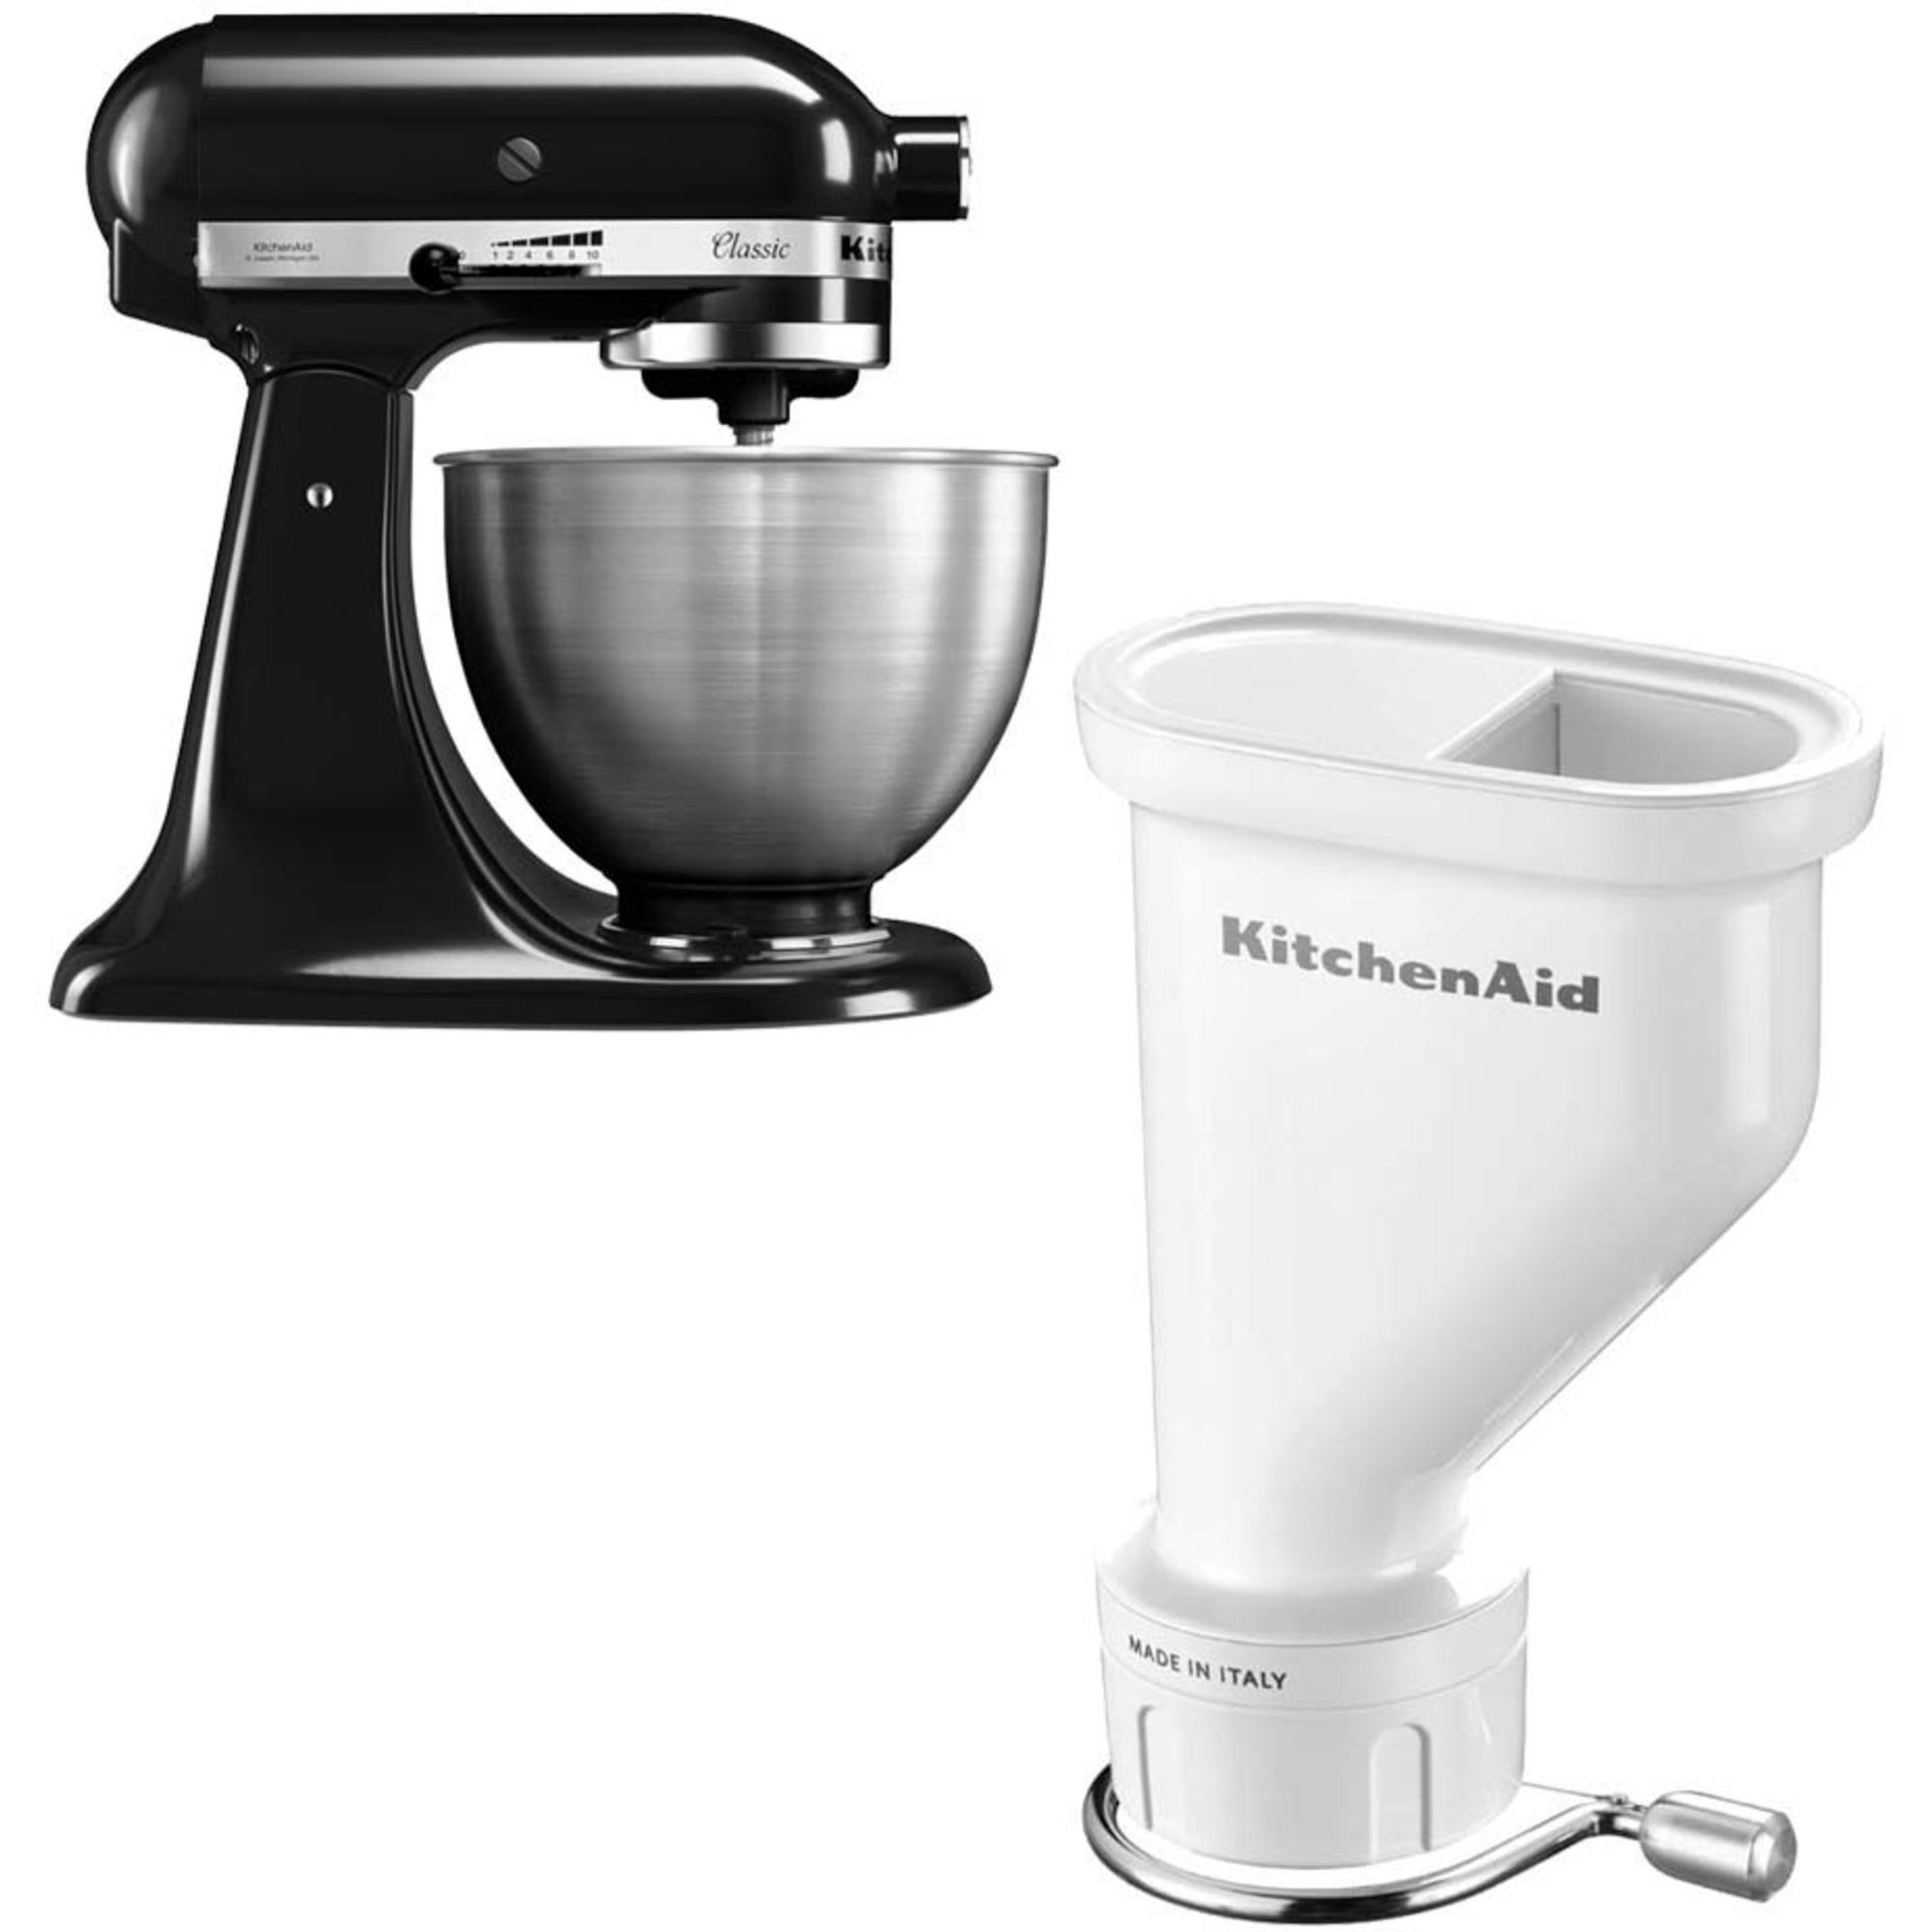 KitchenAid Classic Köksmaskin Svart + Pastapress